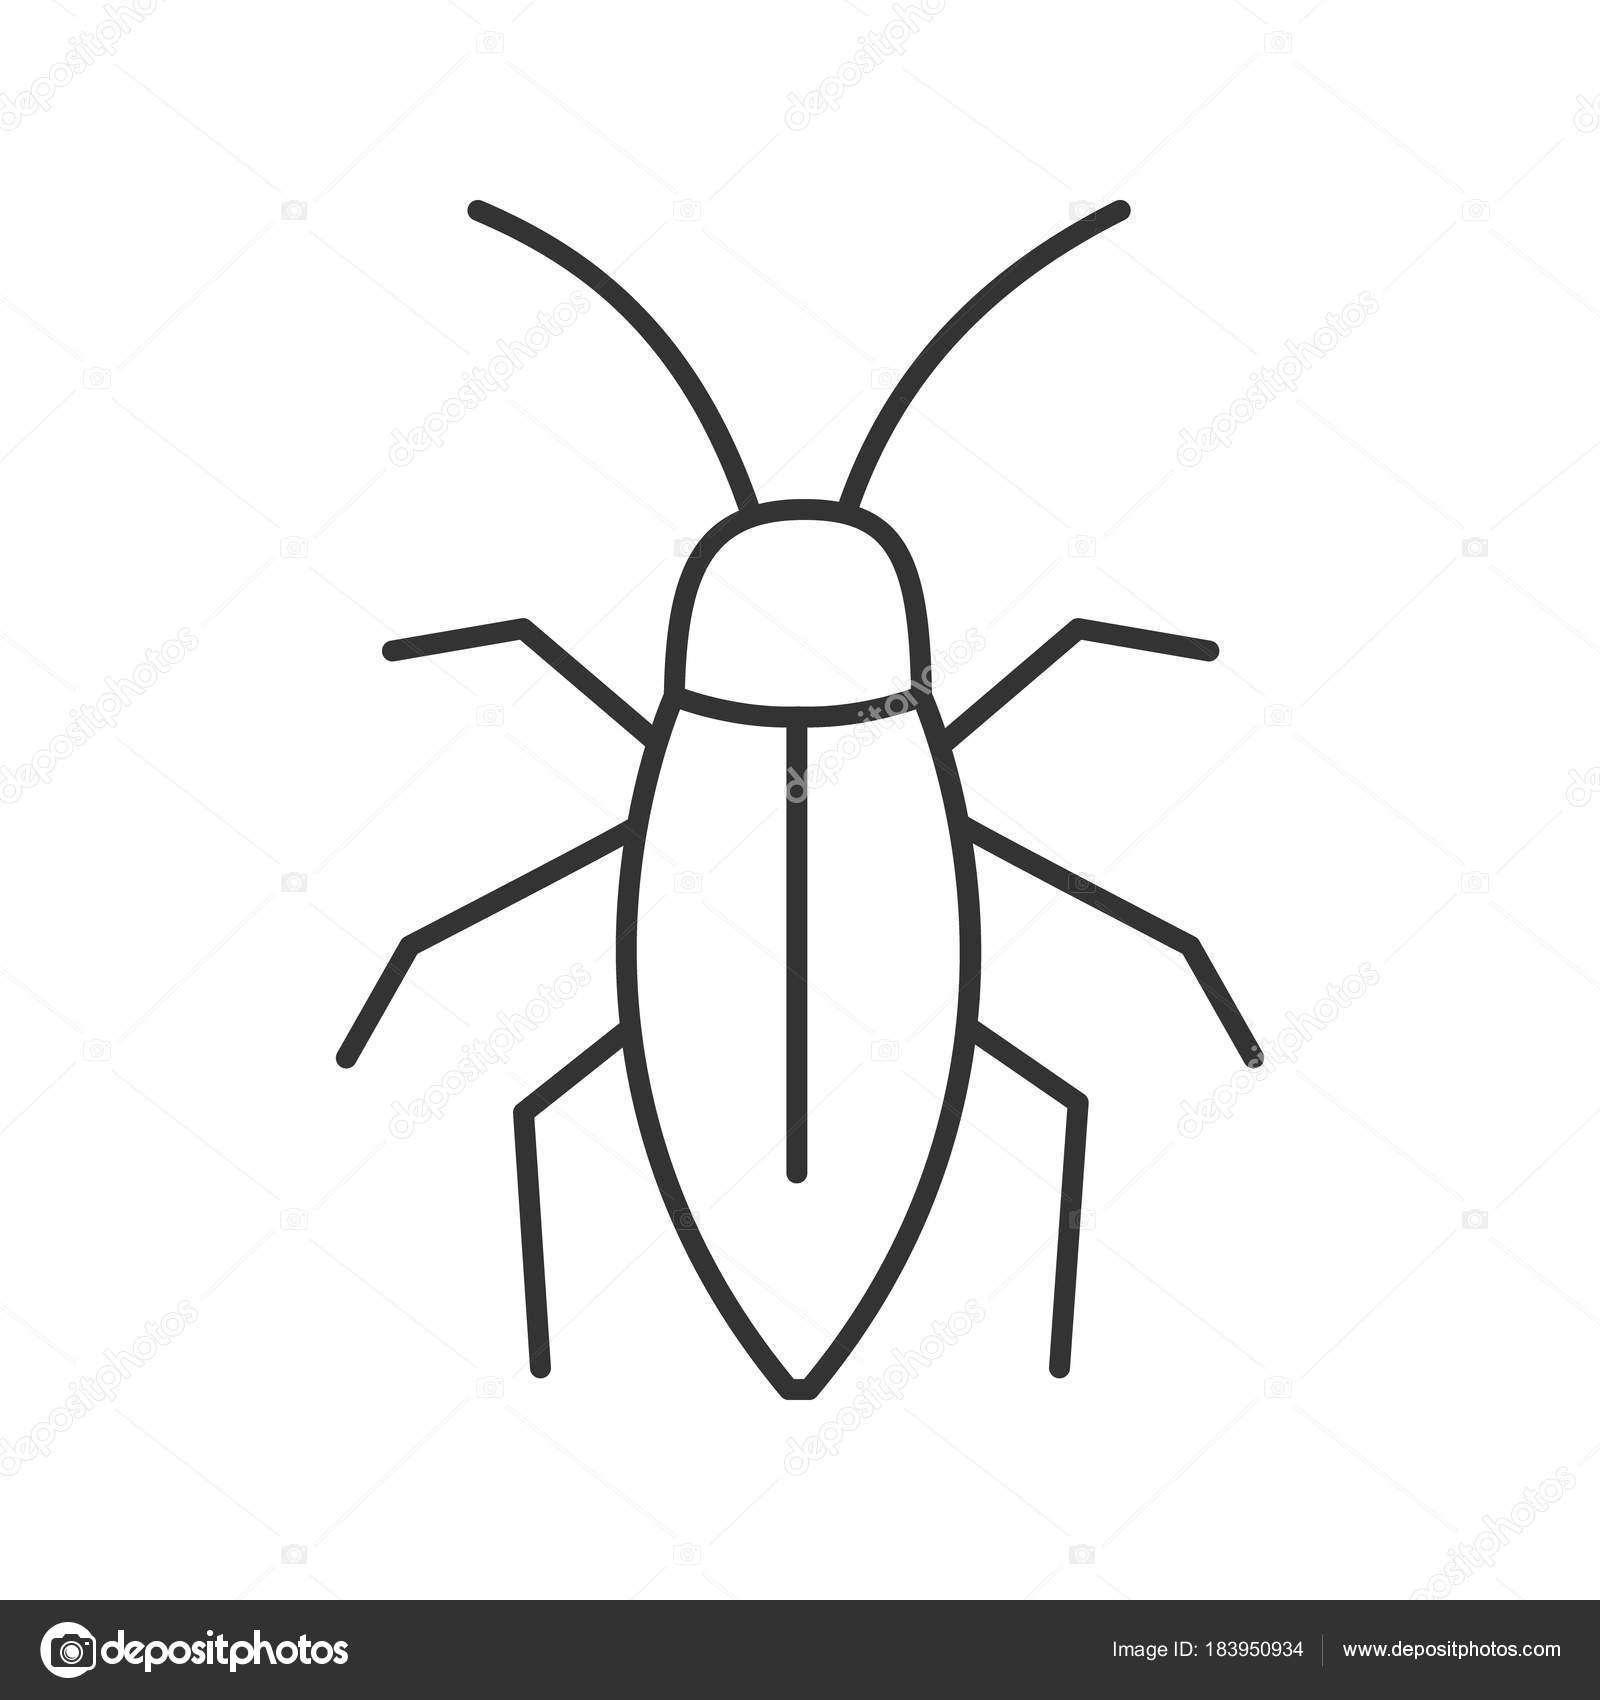 S mbolo lineal cucaracha ilustraci n l nea delgada s mbolo contorno vector aislado vector de - Dessin de cafard ...